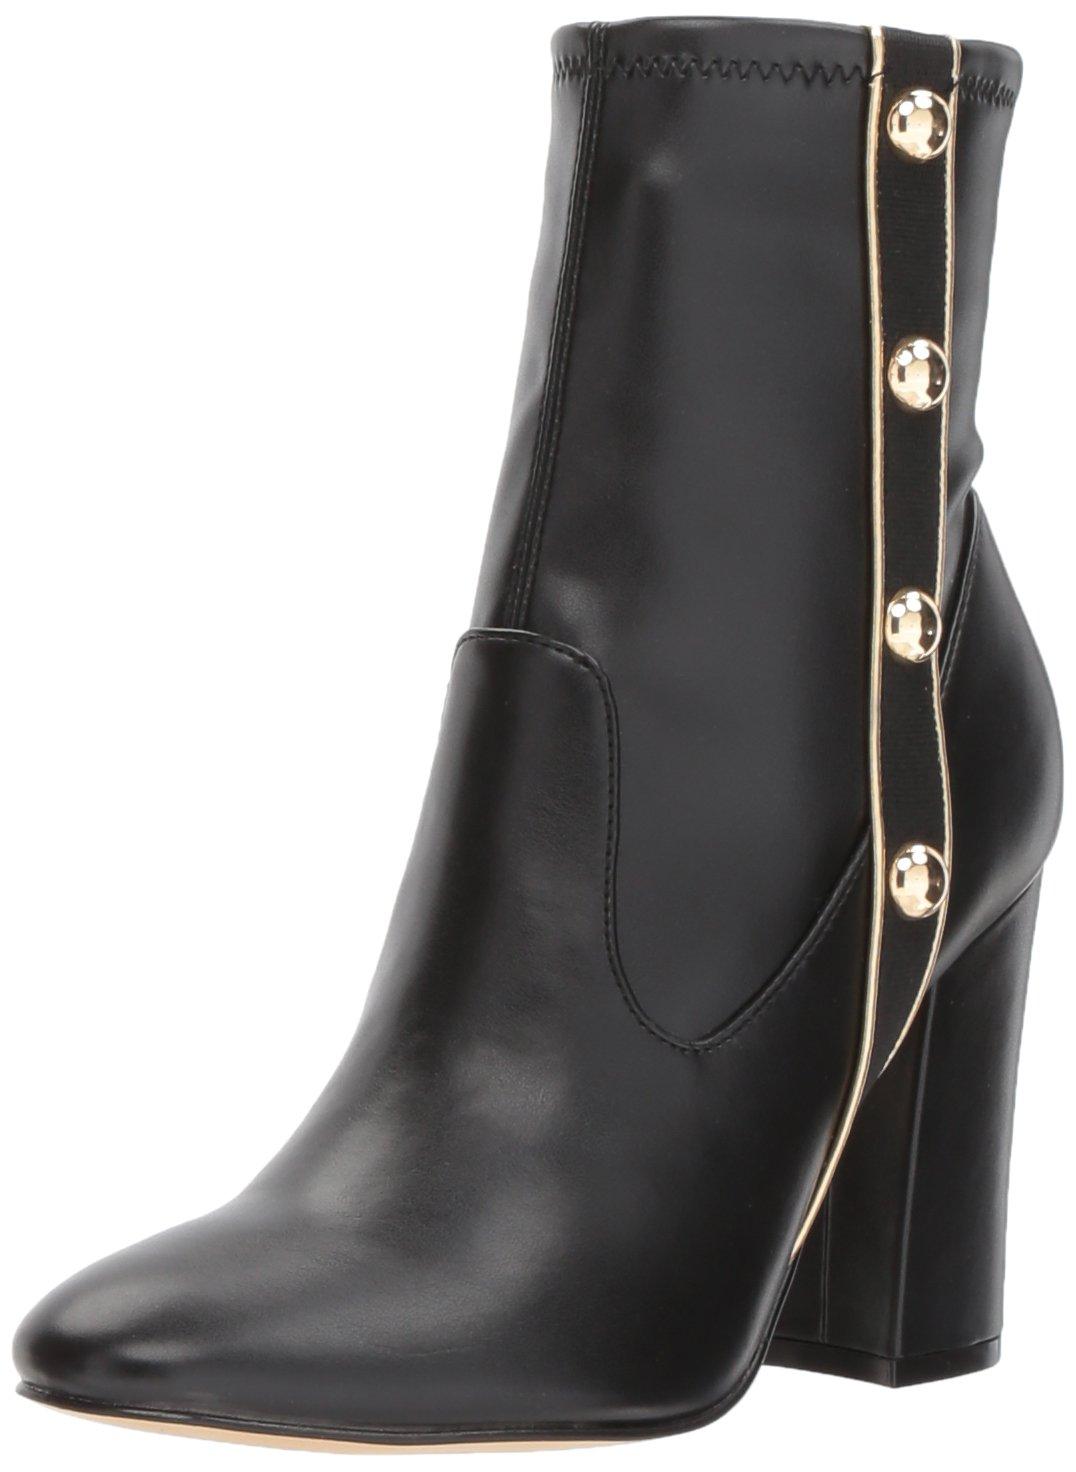 486ec9bff14 Marc Fisher Fisher Fisher Women s Abela Fashion Boot B071P7PBFD 7 B(M) US